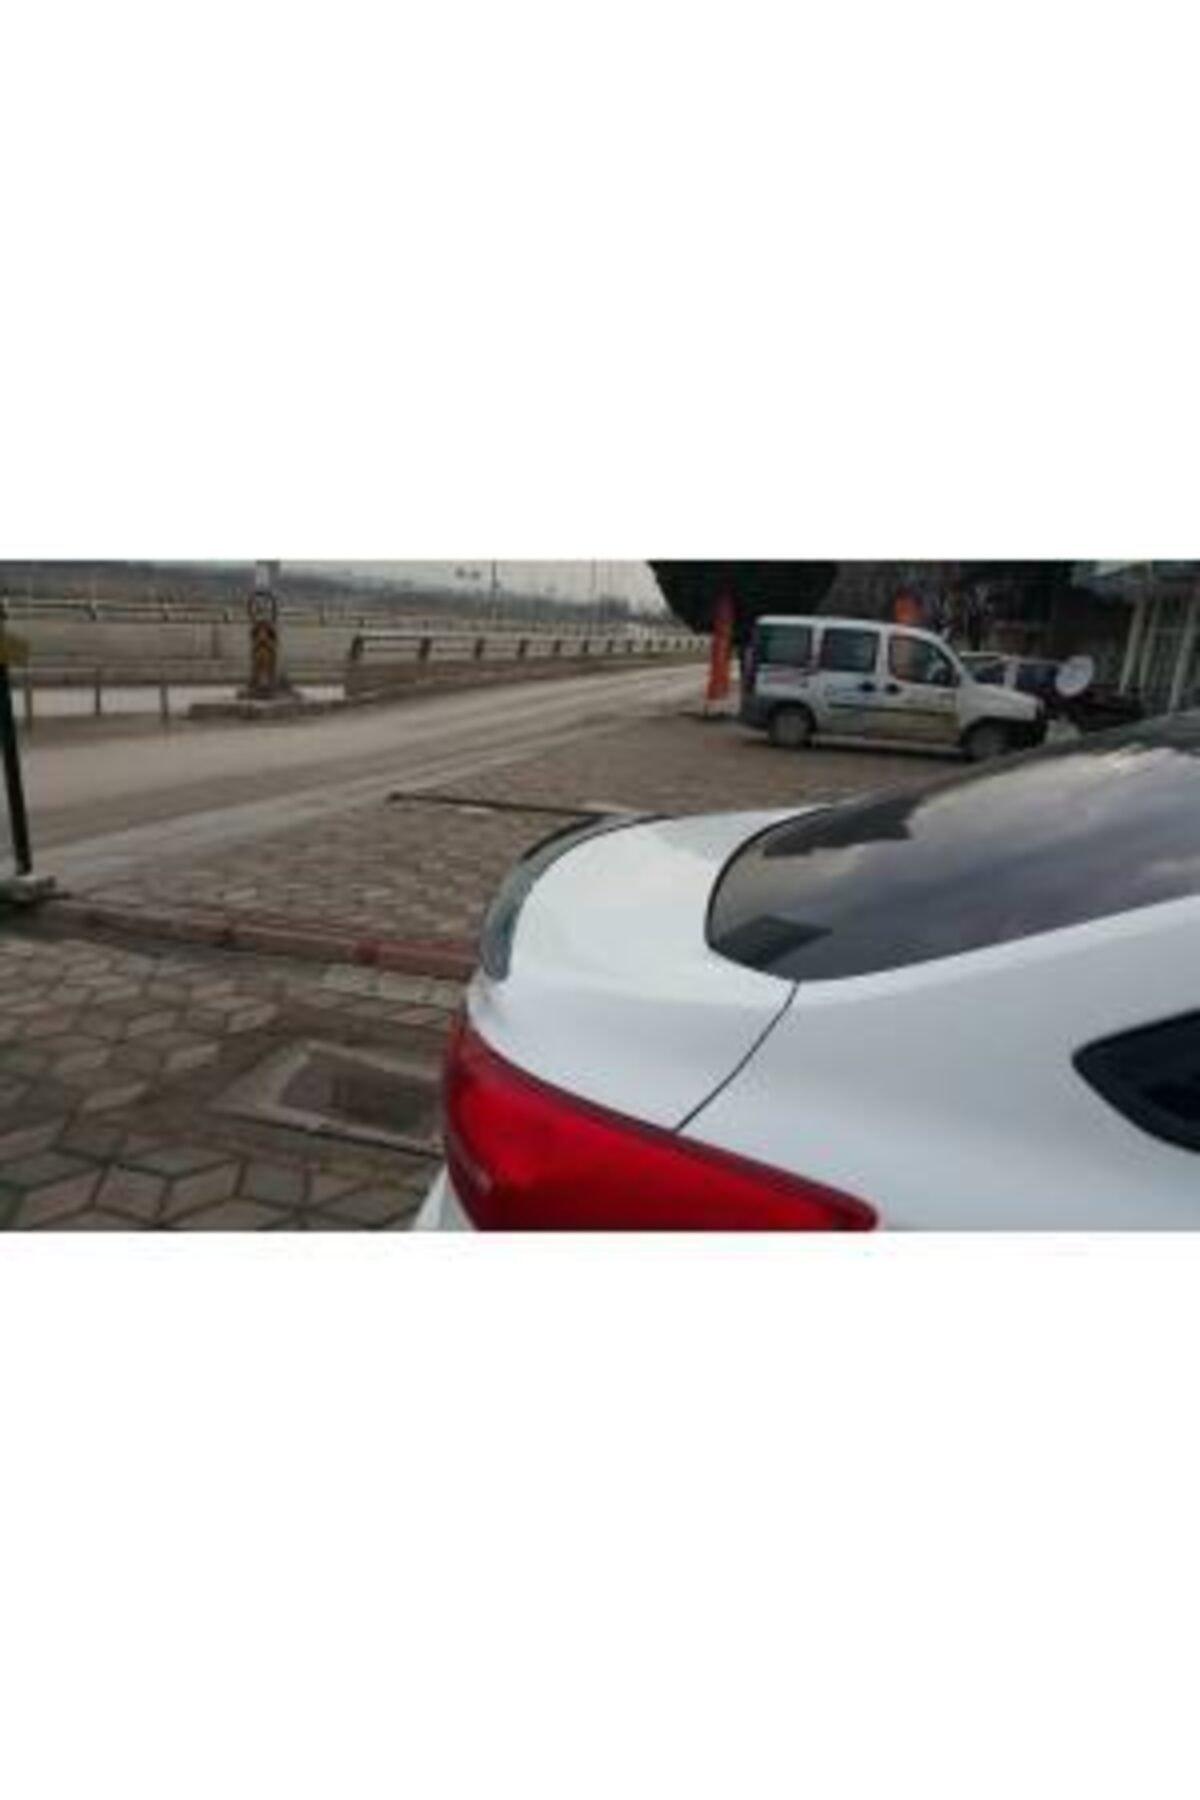 CARPİ Ford Focus (12-18) 3, 3.5, 4 Sedan Kasa Bagaj Üstü Spoiler 1